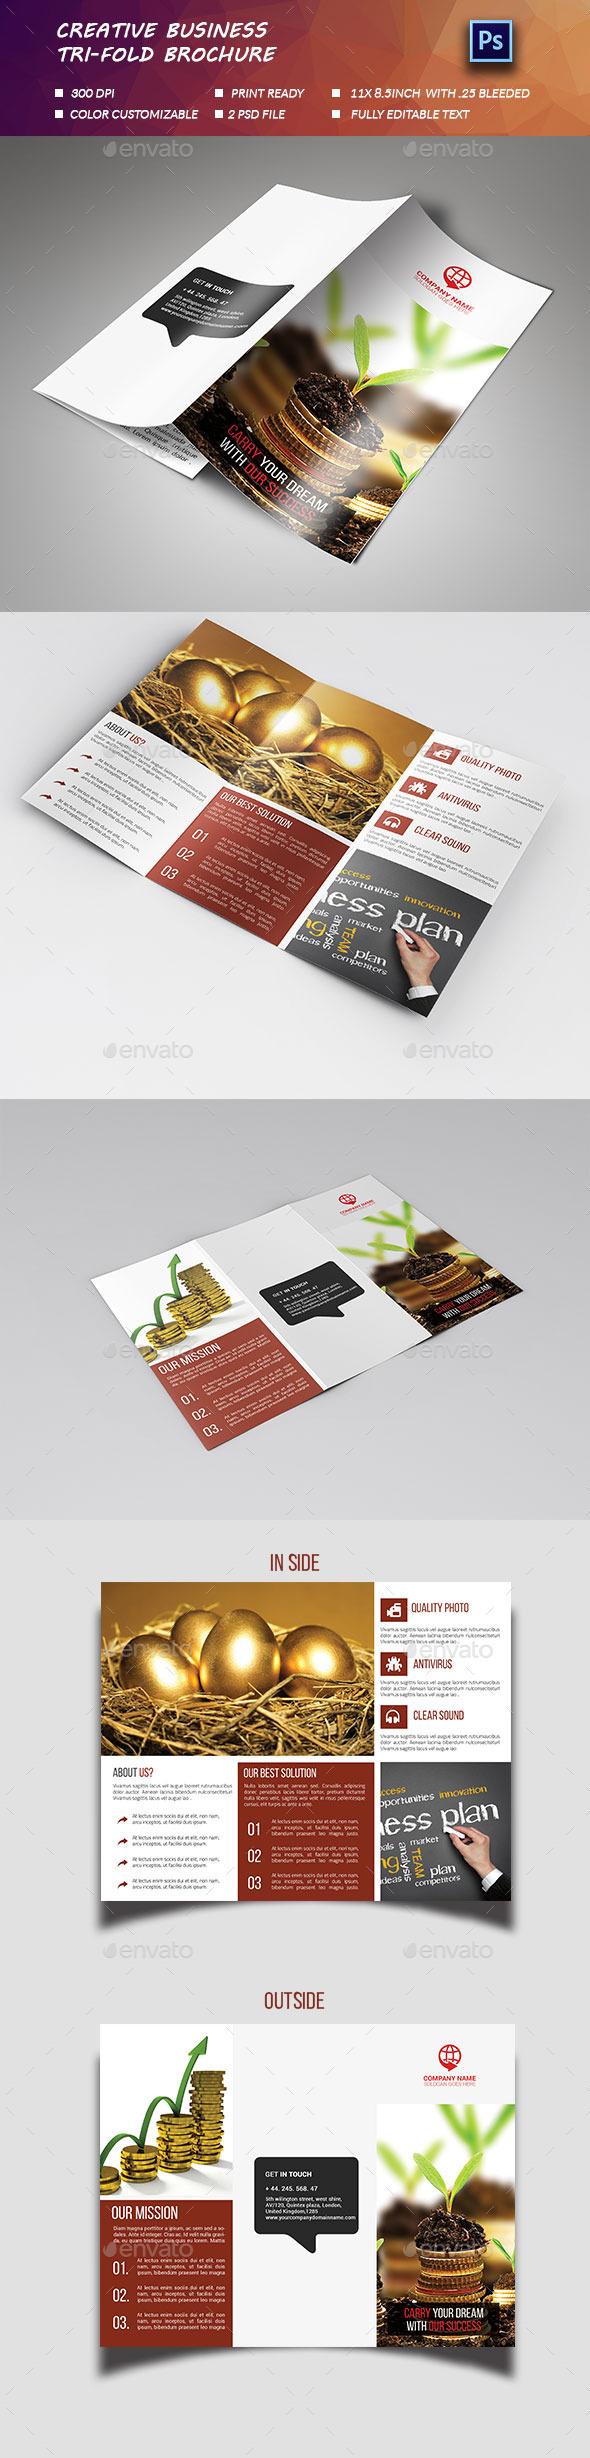 Creative Business Tri fold Brochure  - Brochures Print Templates